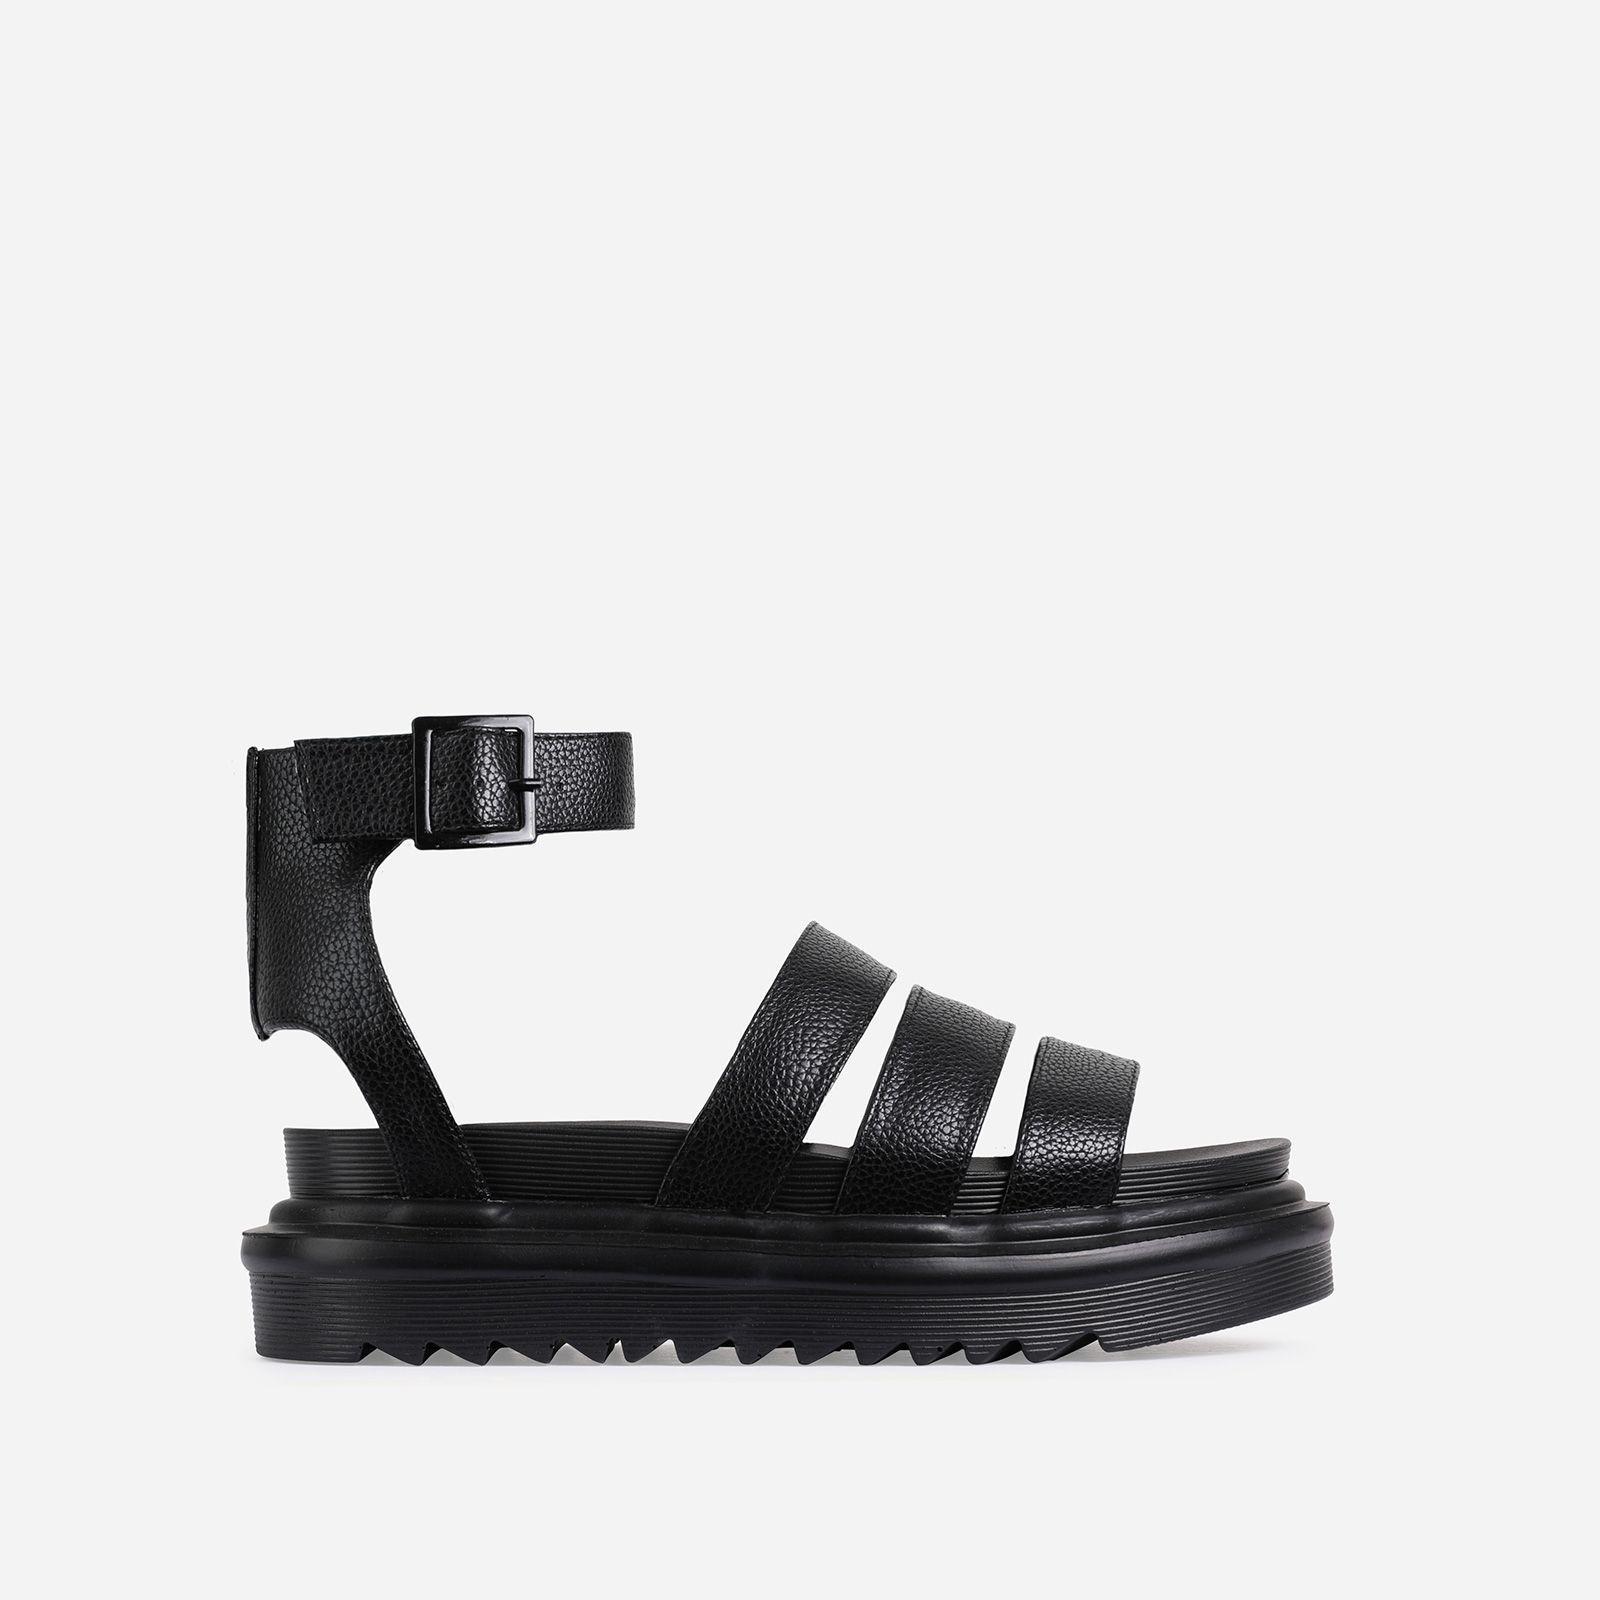 Hater Chunky Sole Flat Gladiator Sandal